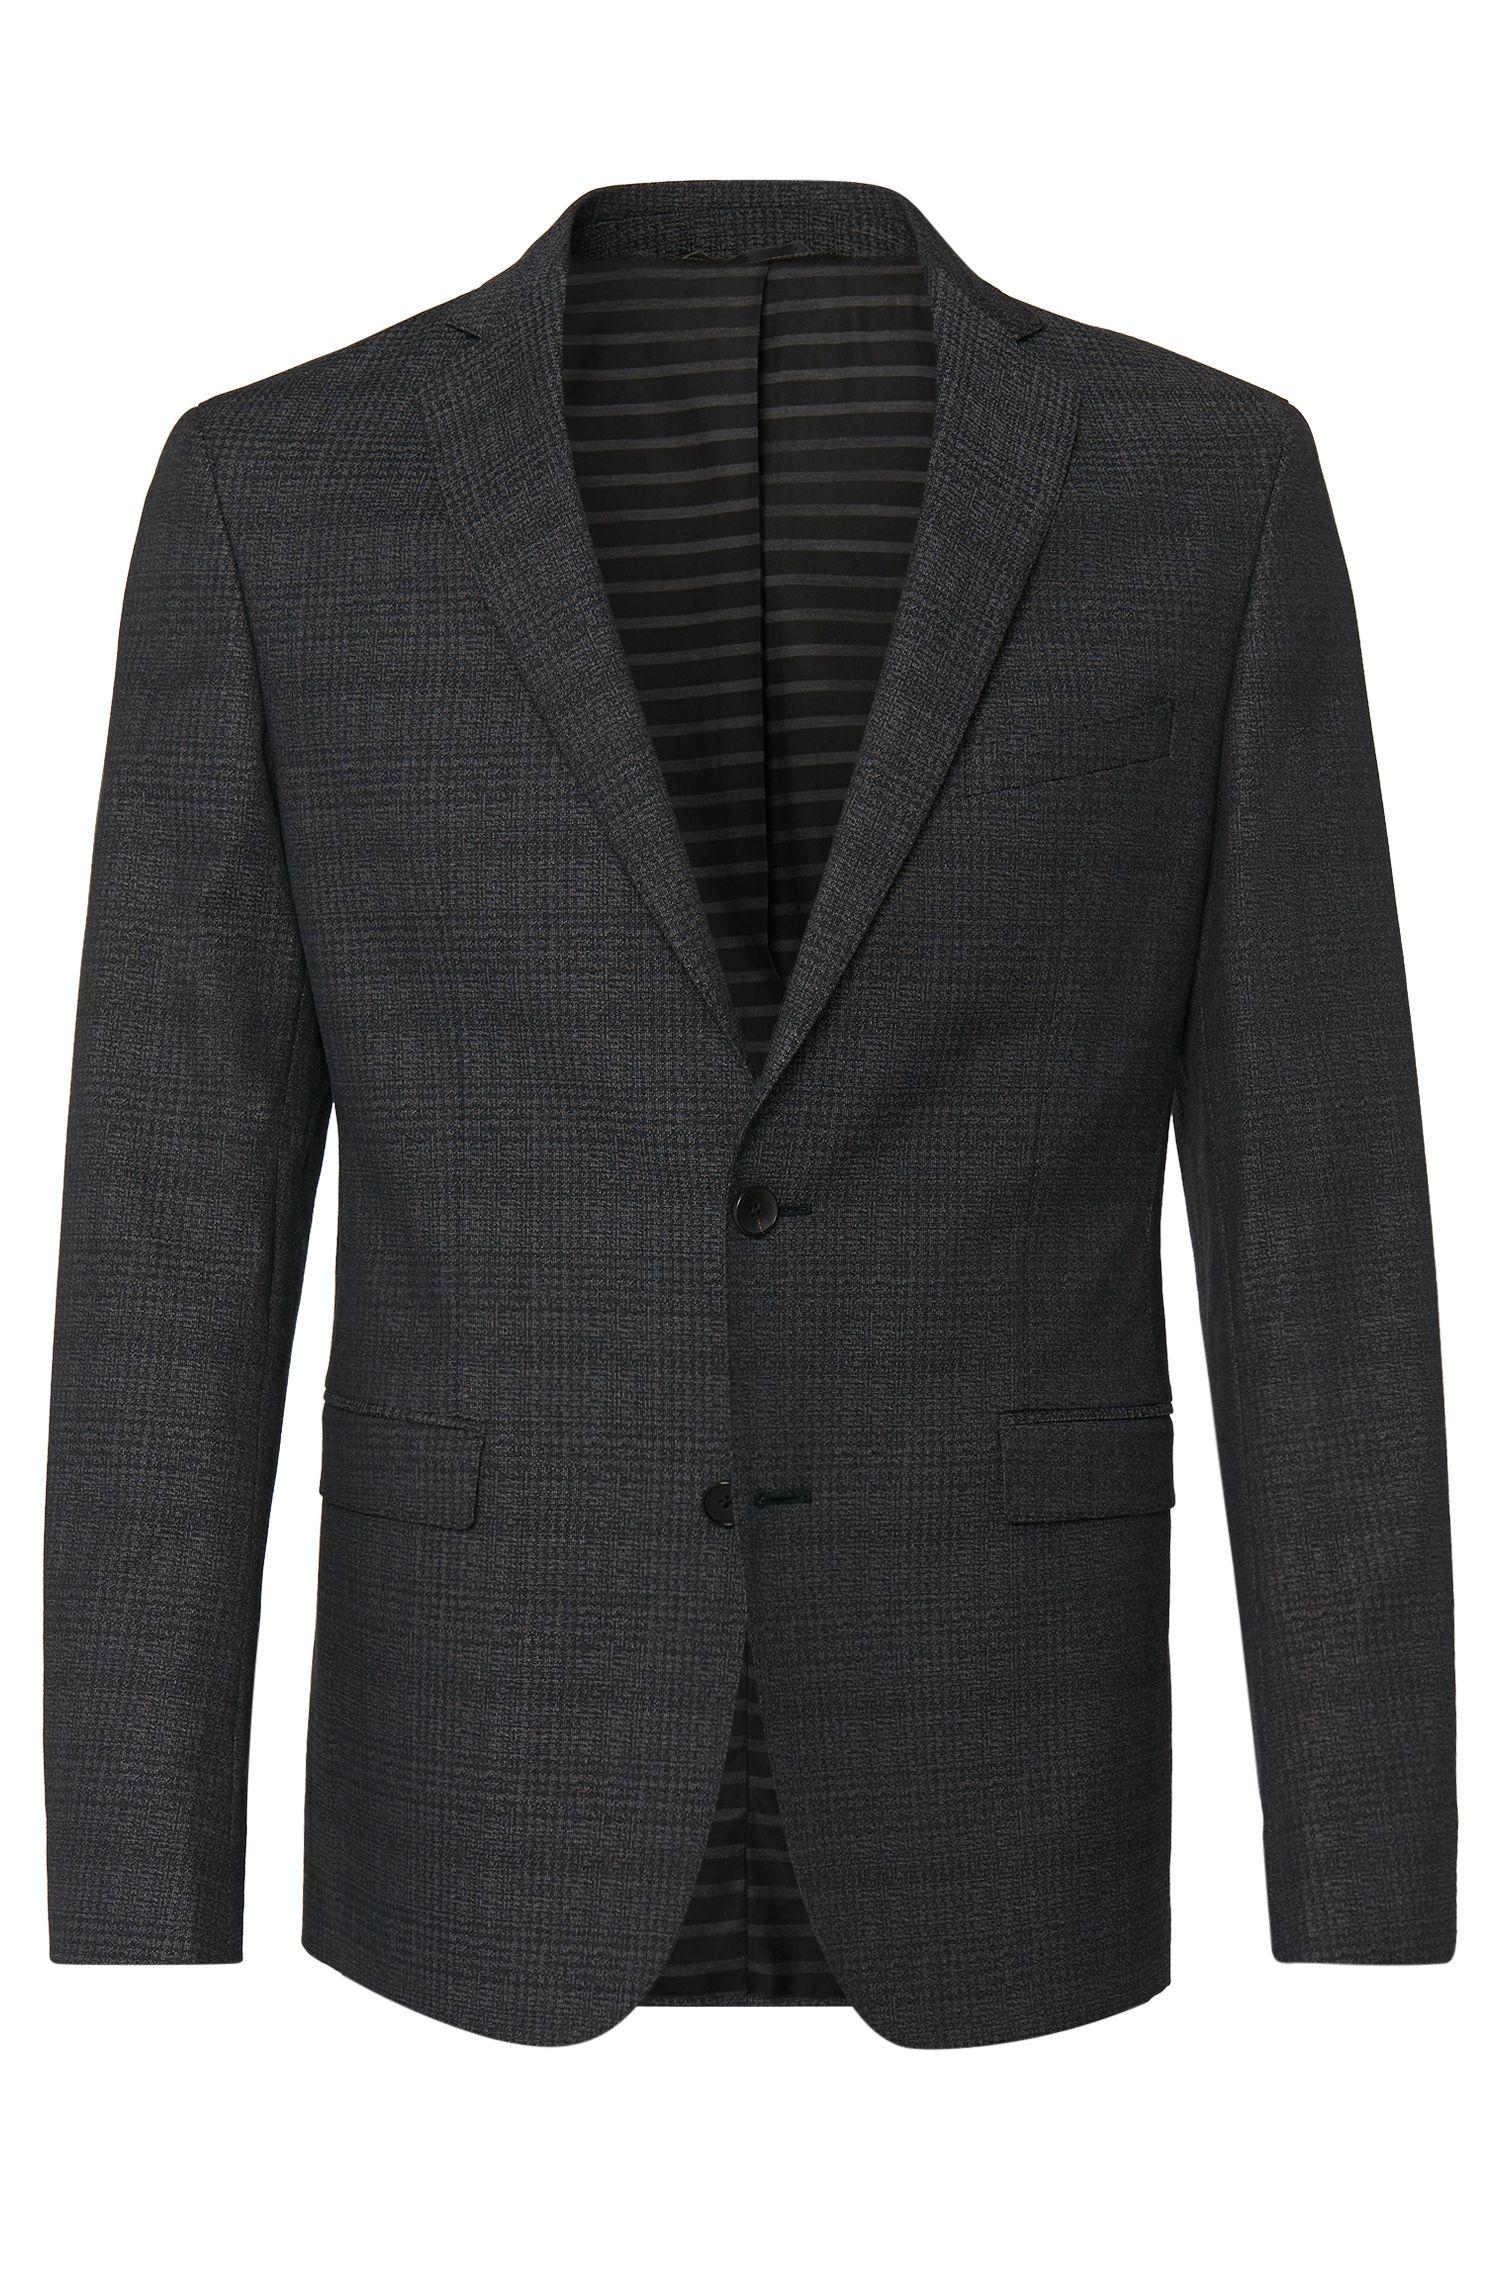 'Ross' | Extra Slim Fit, Stretch Cotton Plaid Sport Coat